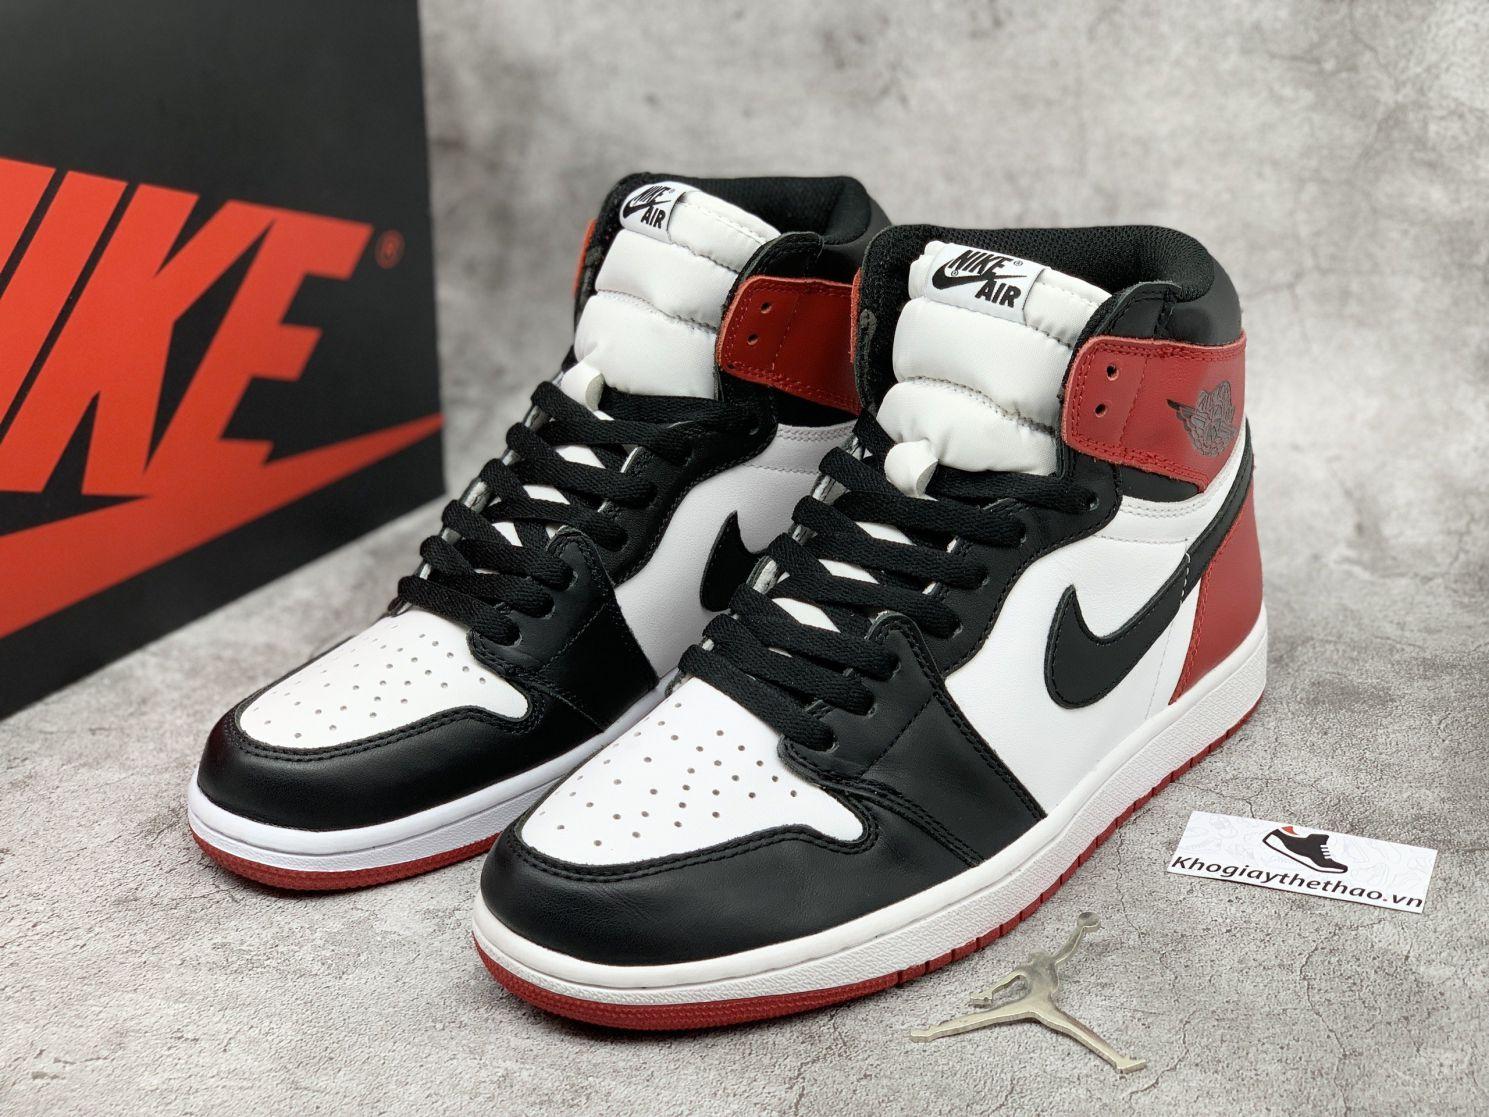 giày Nike Air Jordan 1 Black Toe high cổ cao